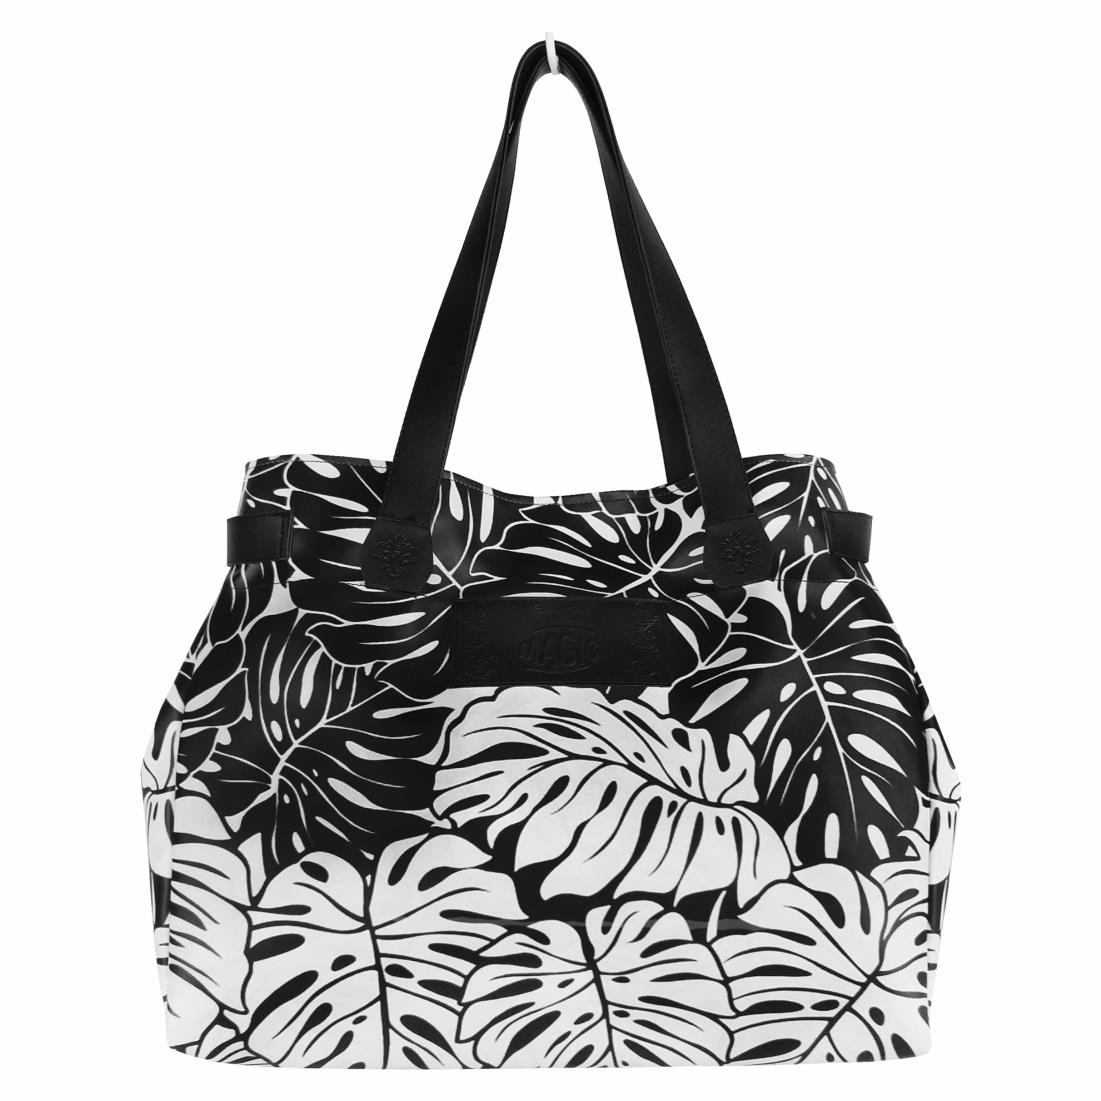 Kit Tropical Feminino Branco e Preto com Bolsa, Necessaire e Chinelo, Magicc